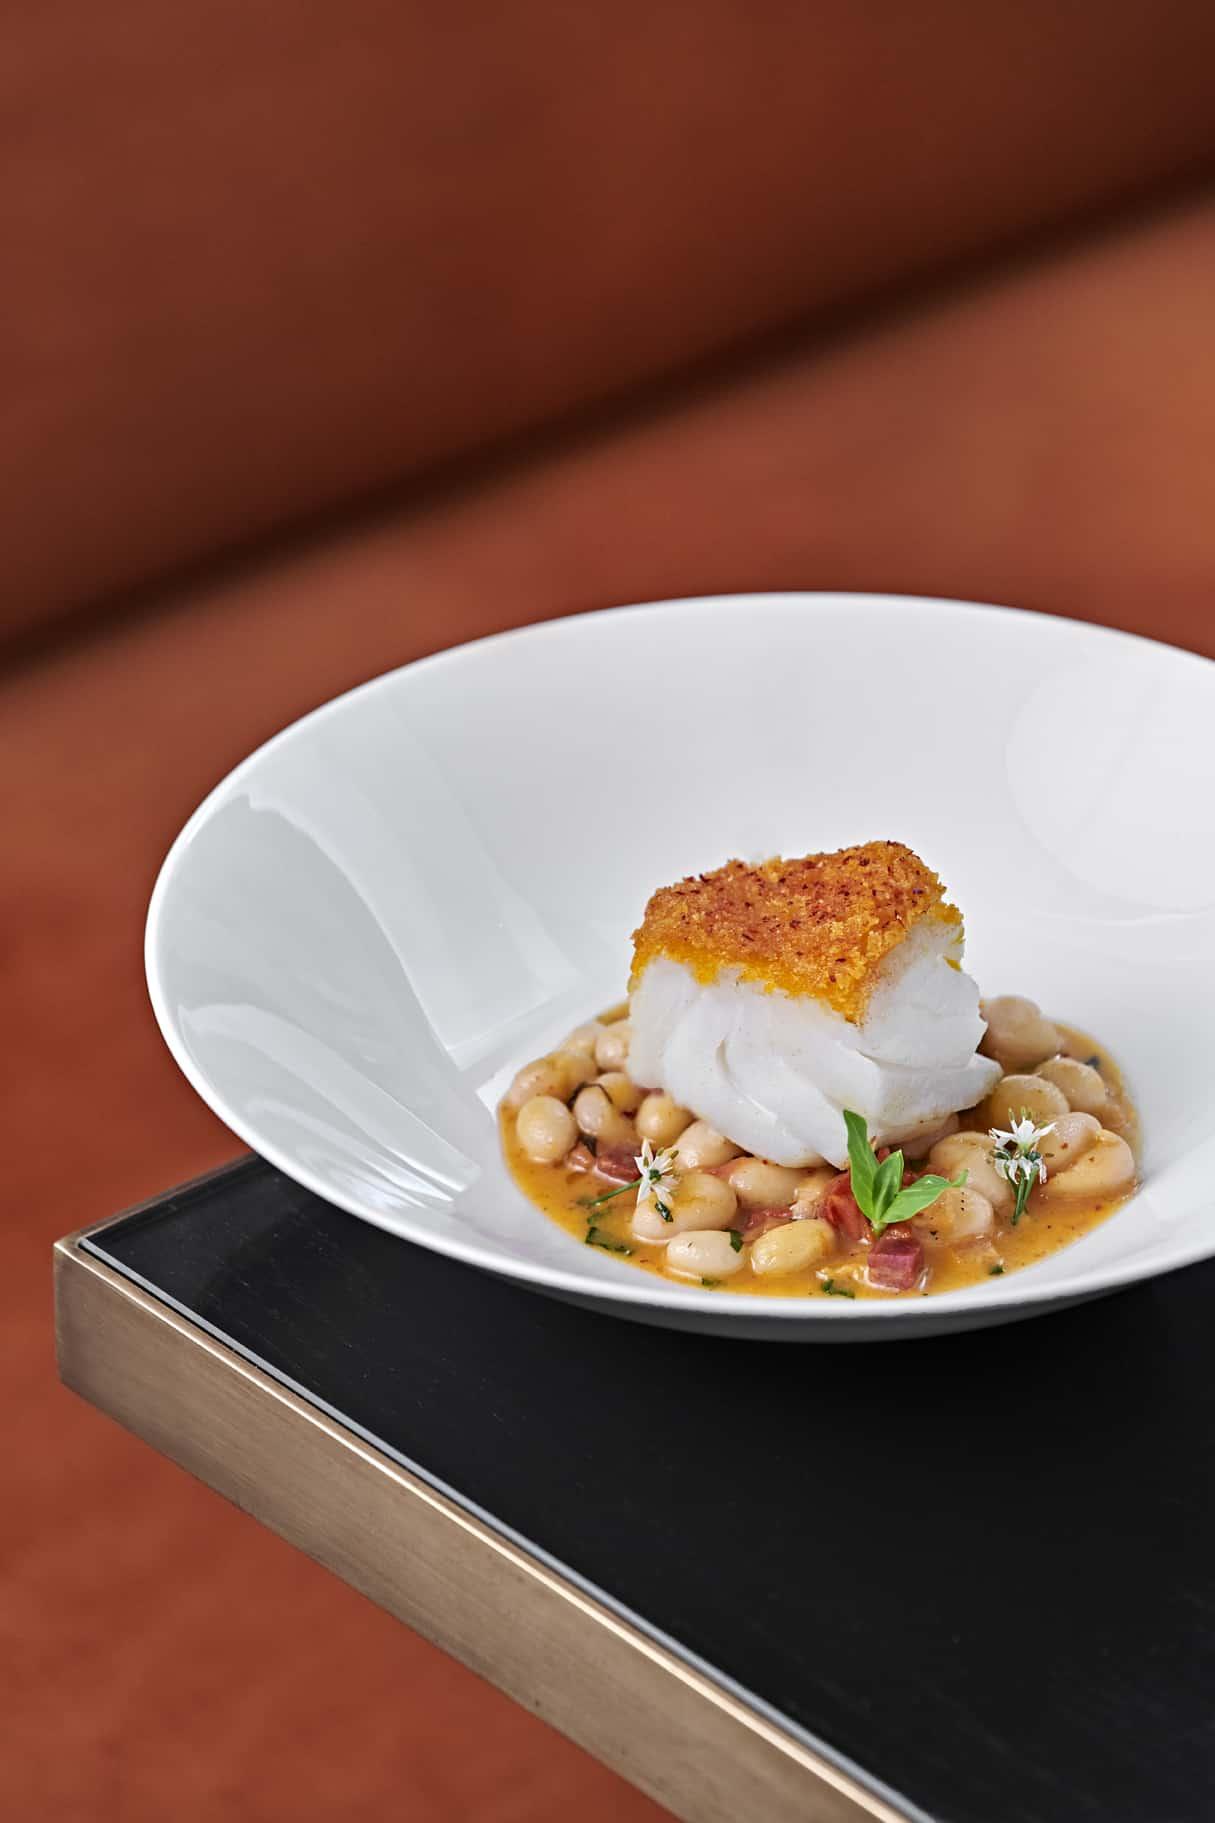 Le Marue - Cod, coco beans, chorizo new restaurant openings